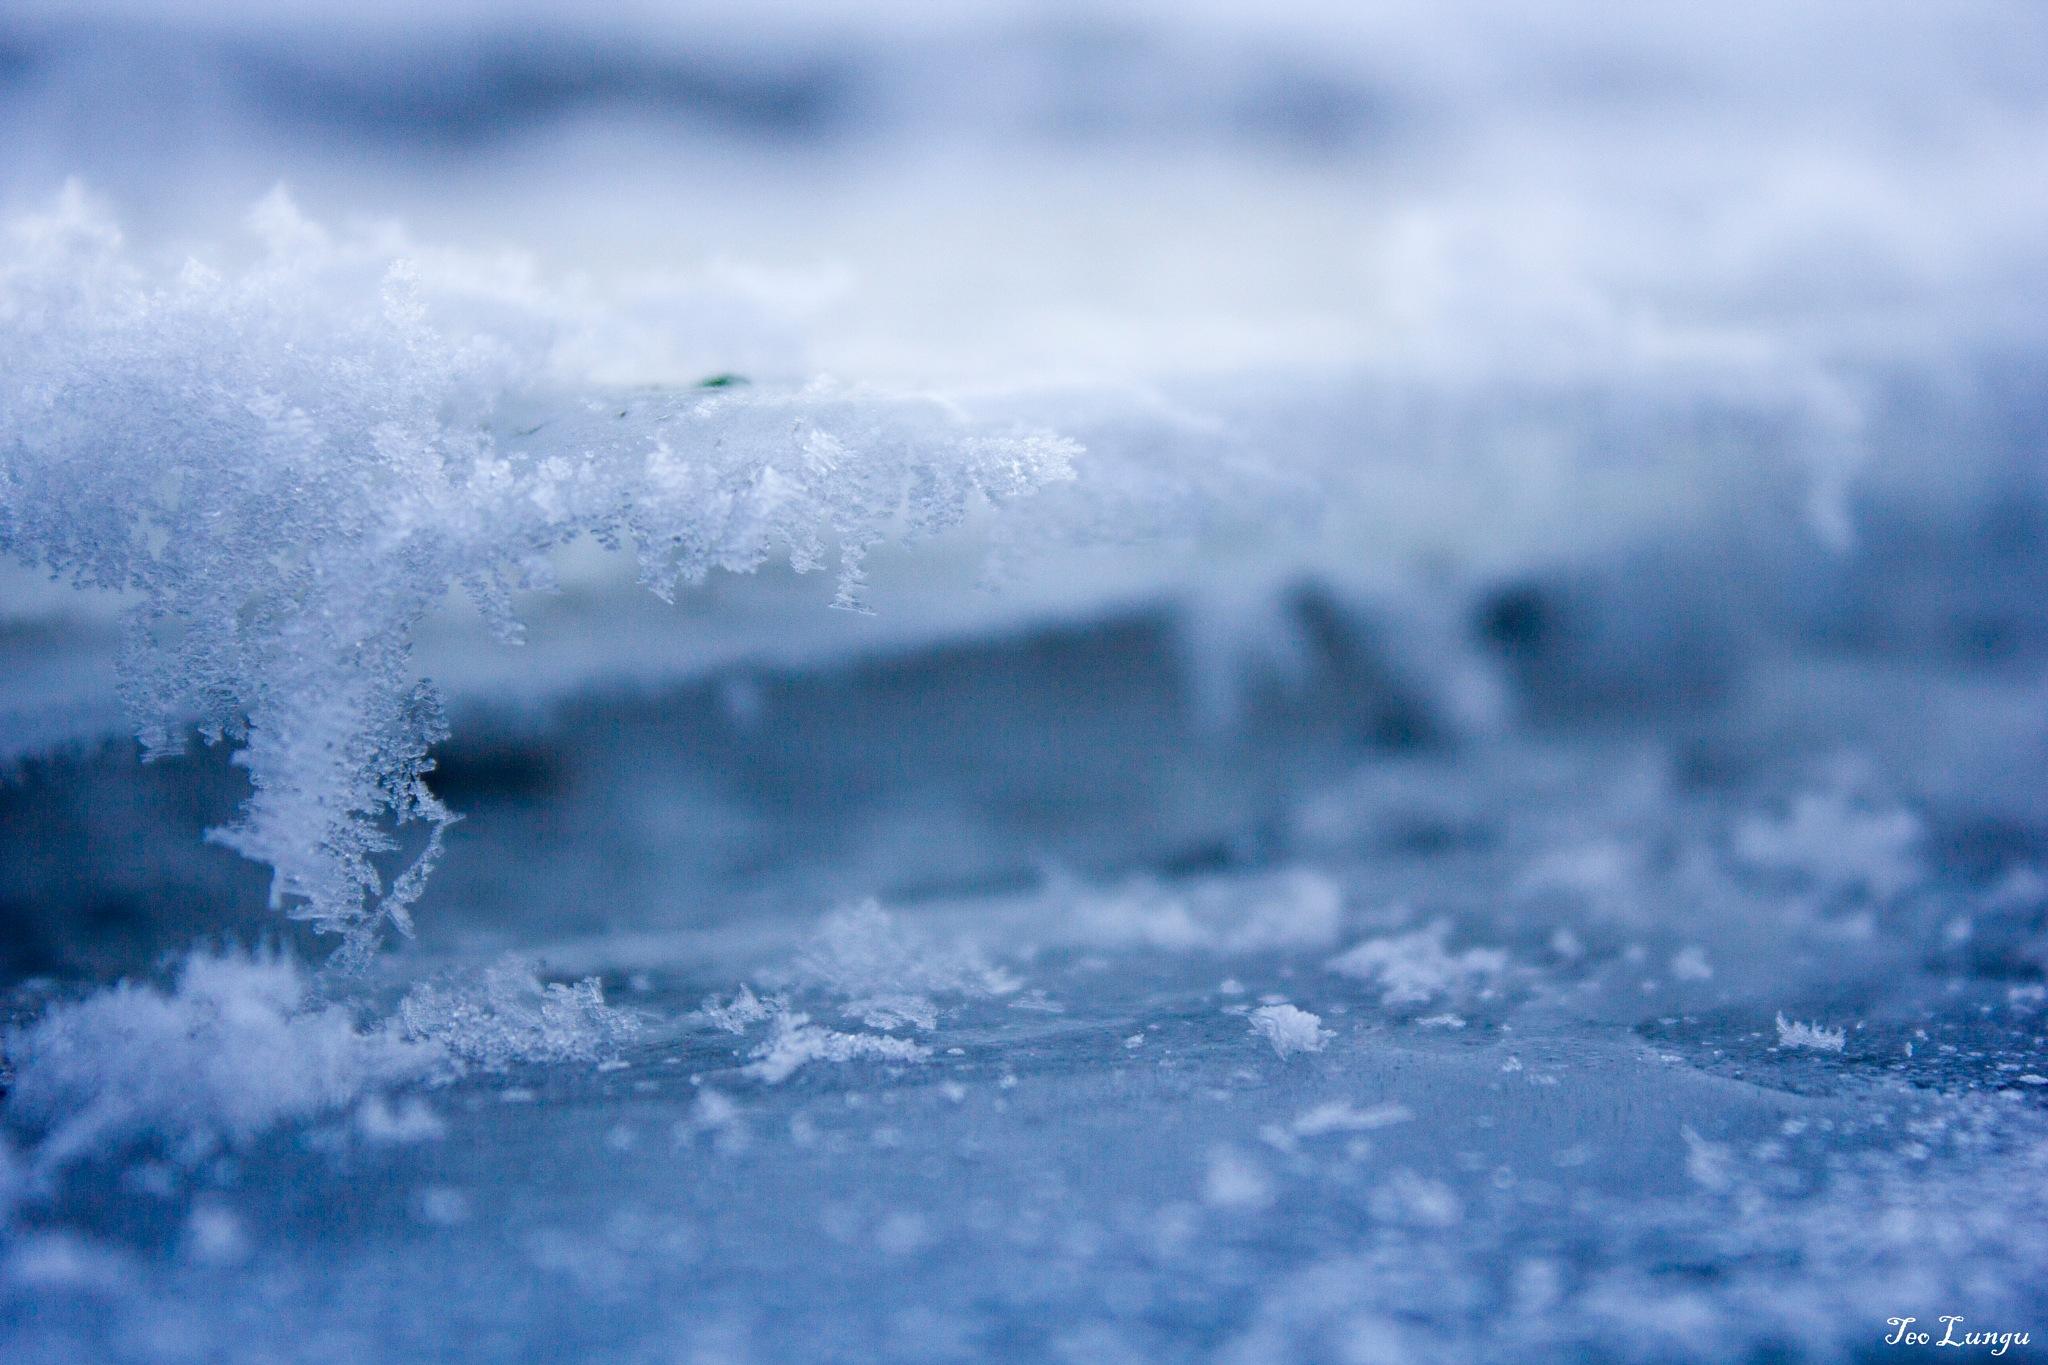 Freezing by Teo Lungu